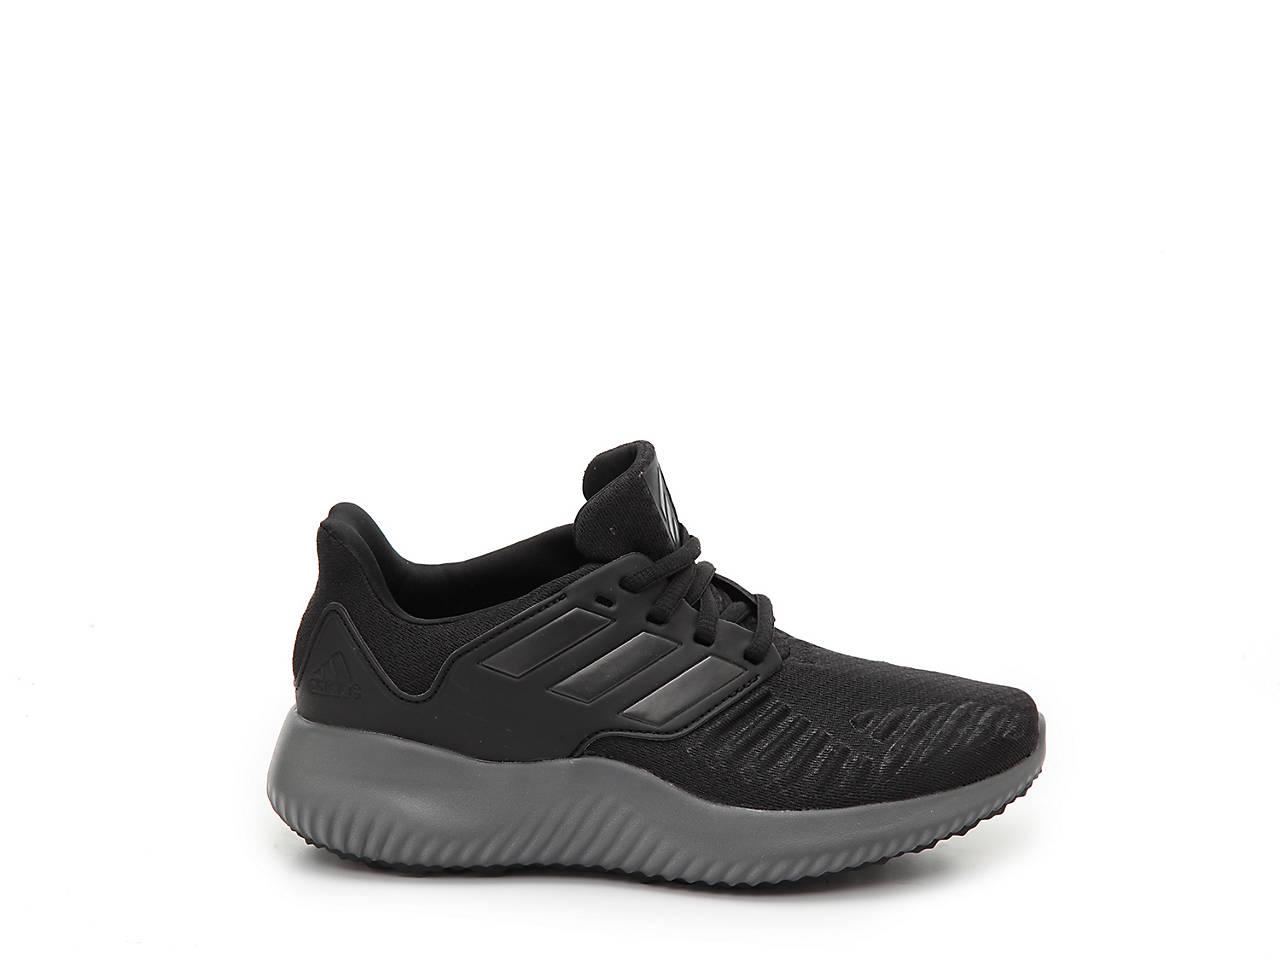 adidas alphabounce gioventù scarpa da corsa, ragazzi scarpe dsw